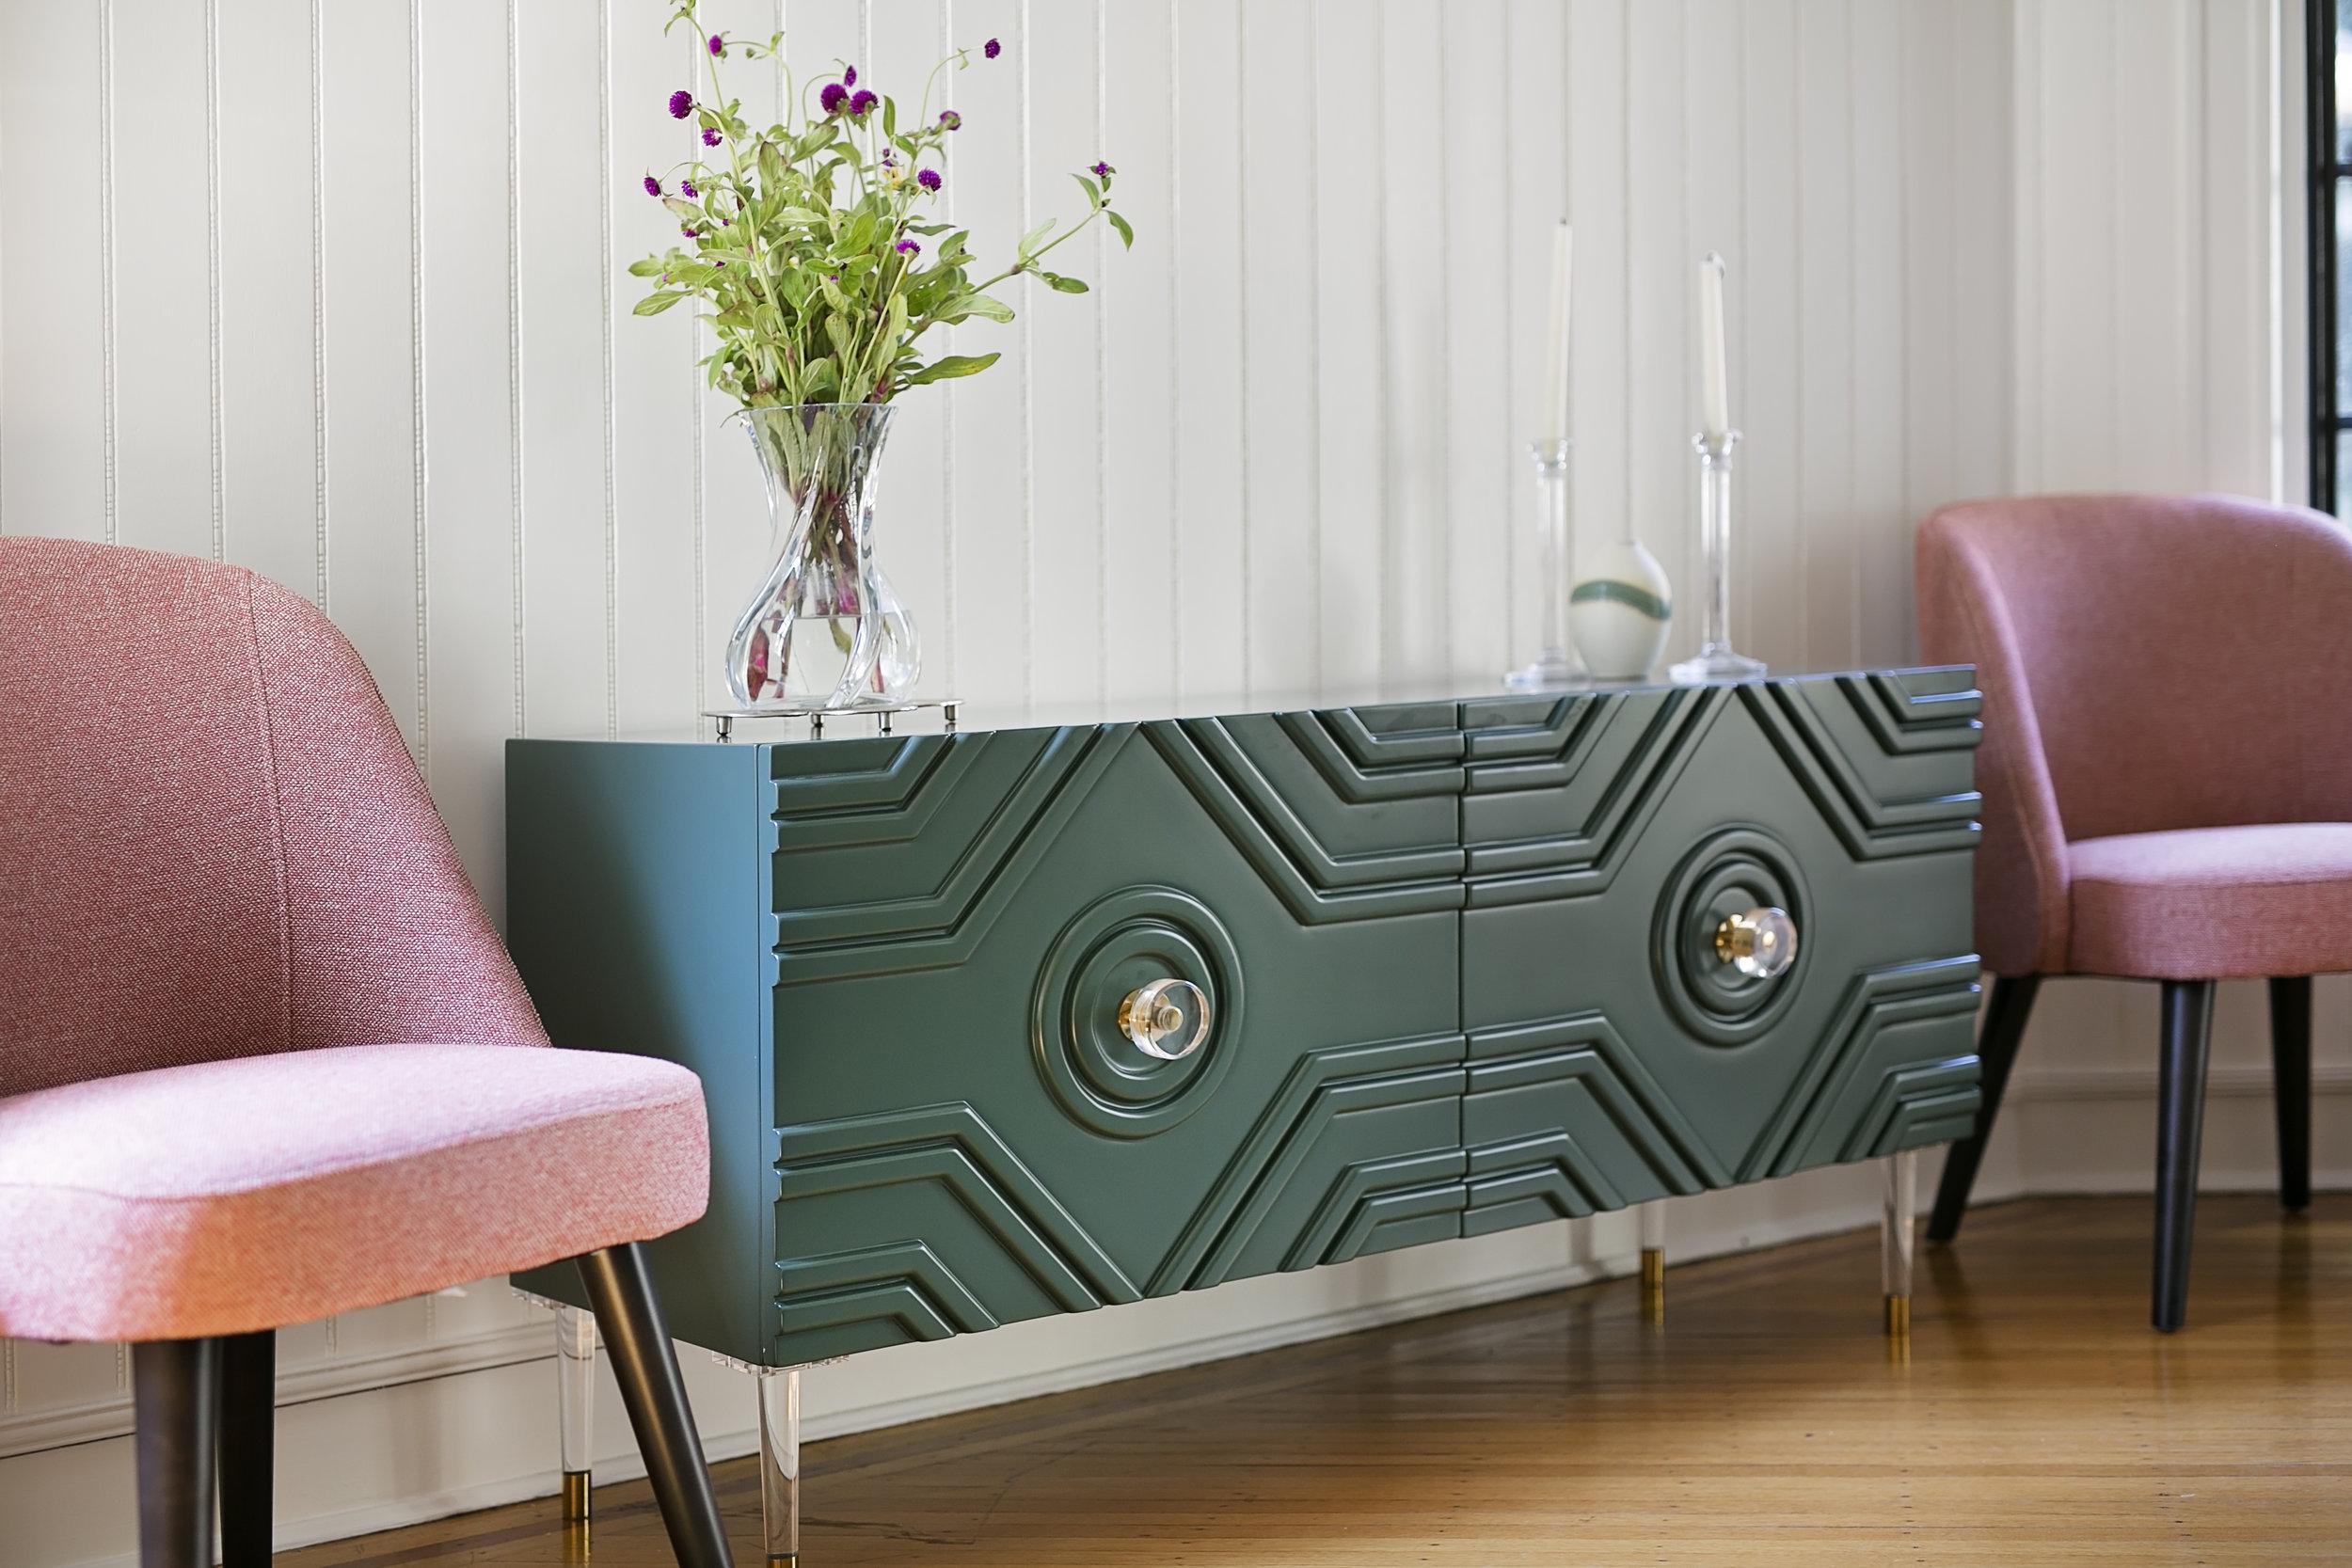 Pink-West-Elm-Chair-Hunter-Green-Credenza-Dining-Room.jpg